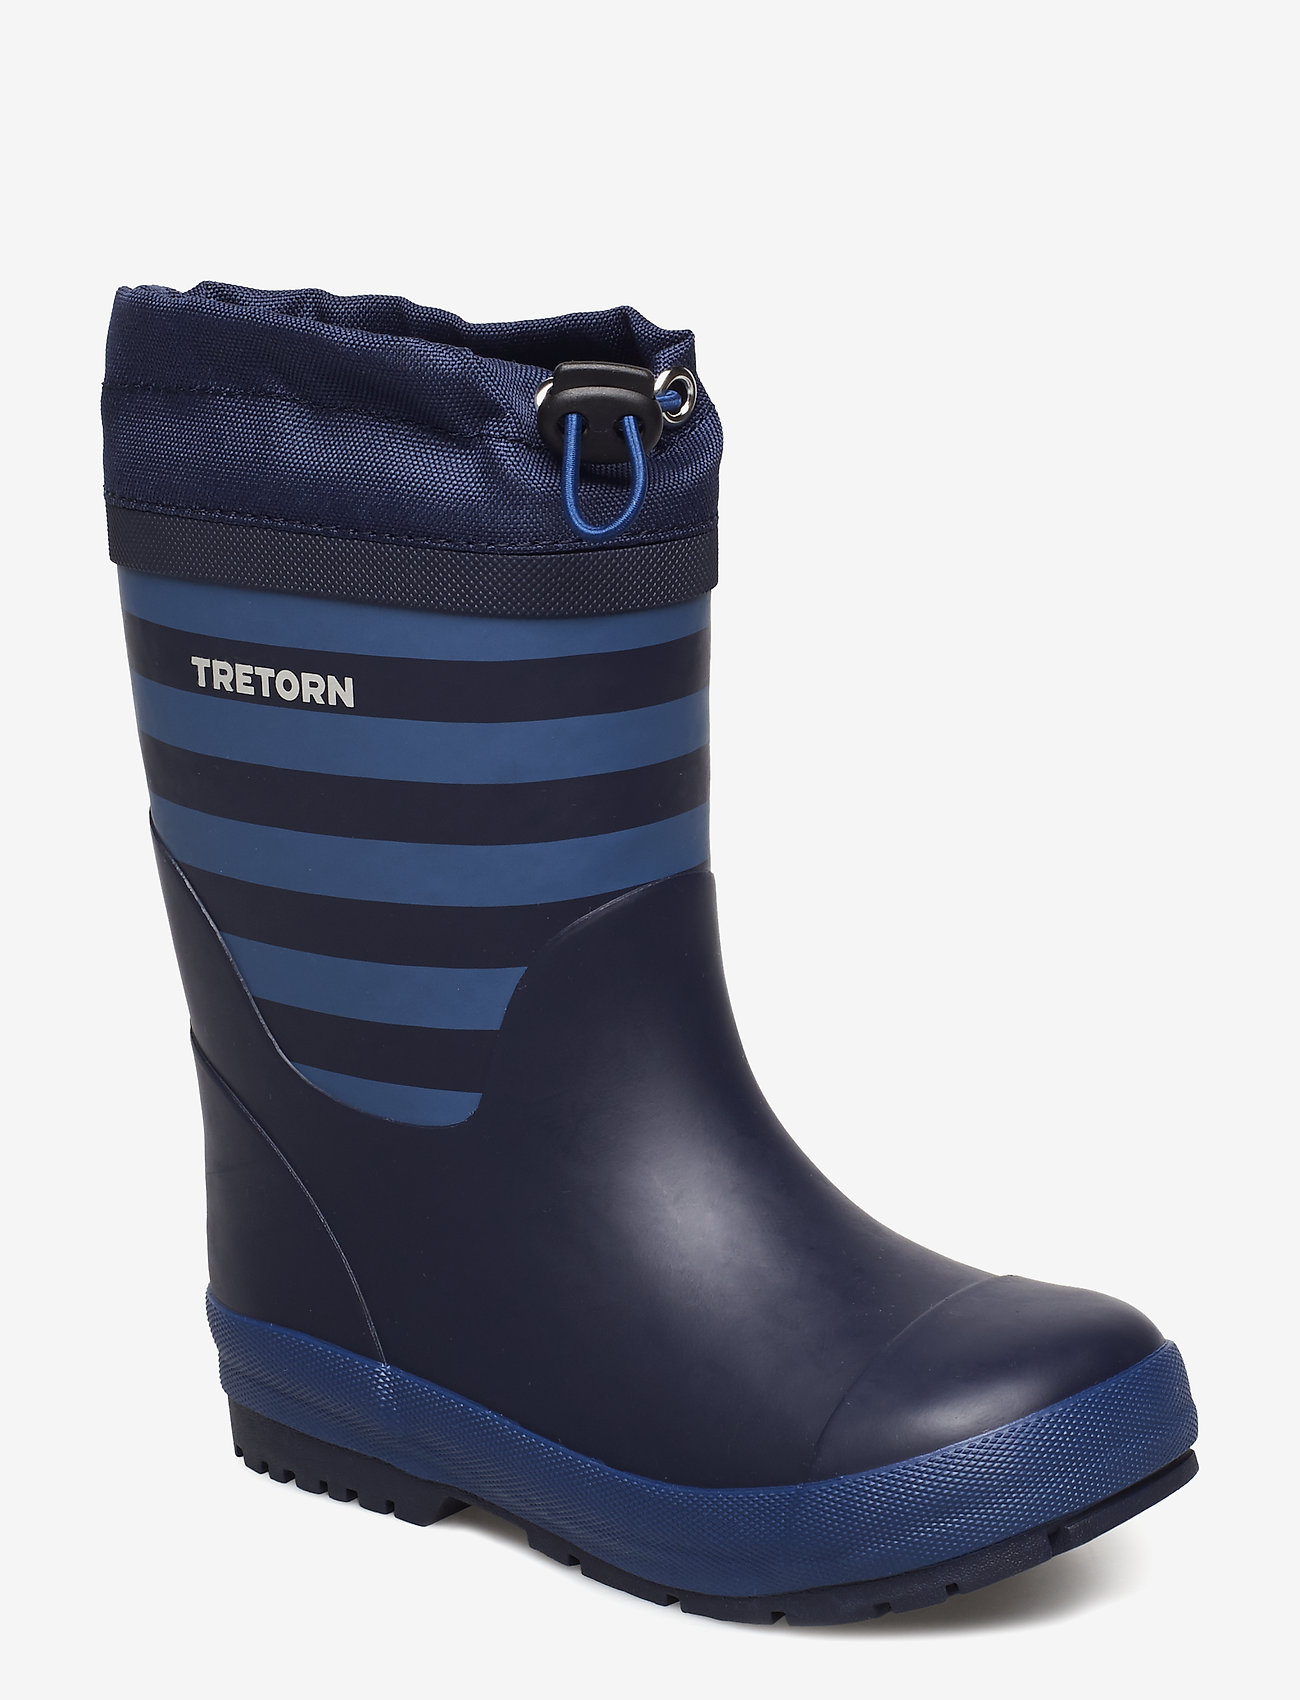 Tretorn - GRNNA VINTER - bottes en chaouthouc - 084/navy/storm - 0